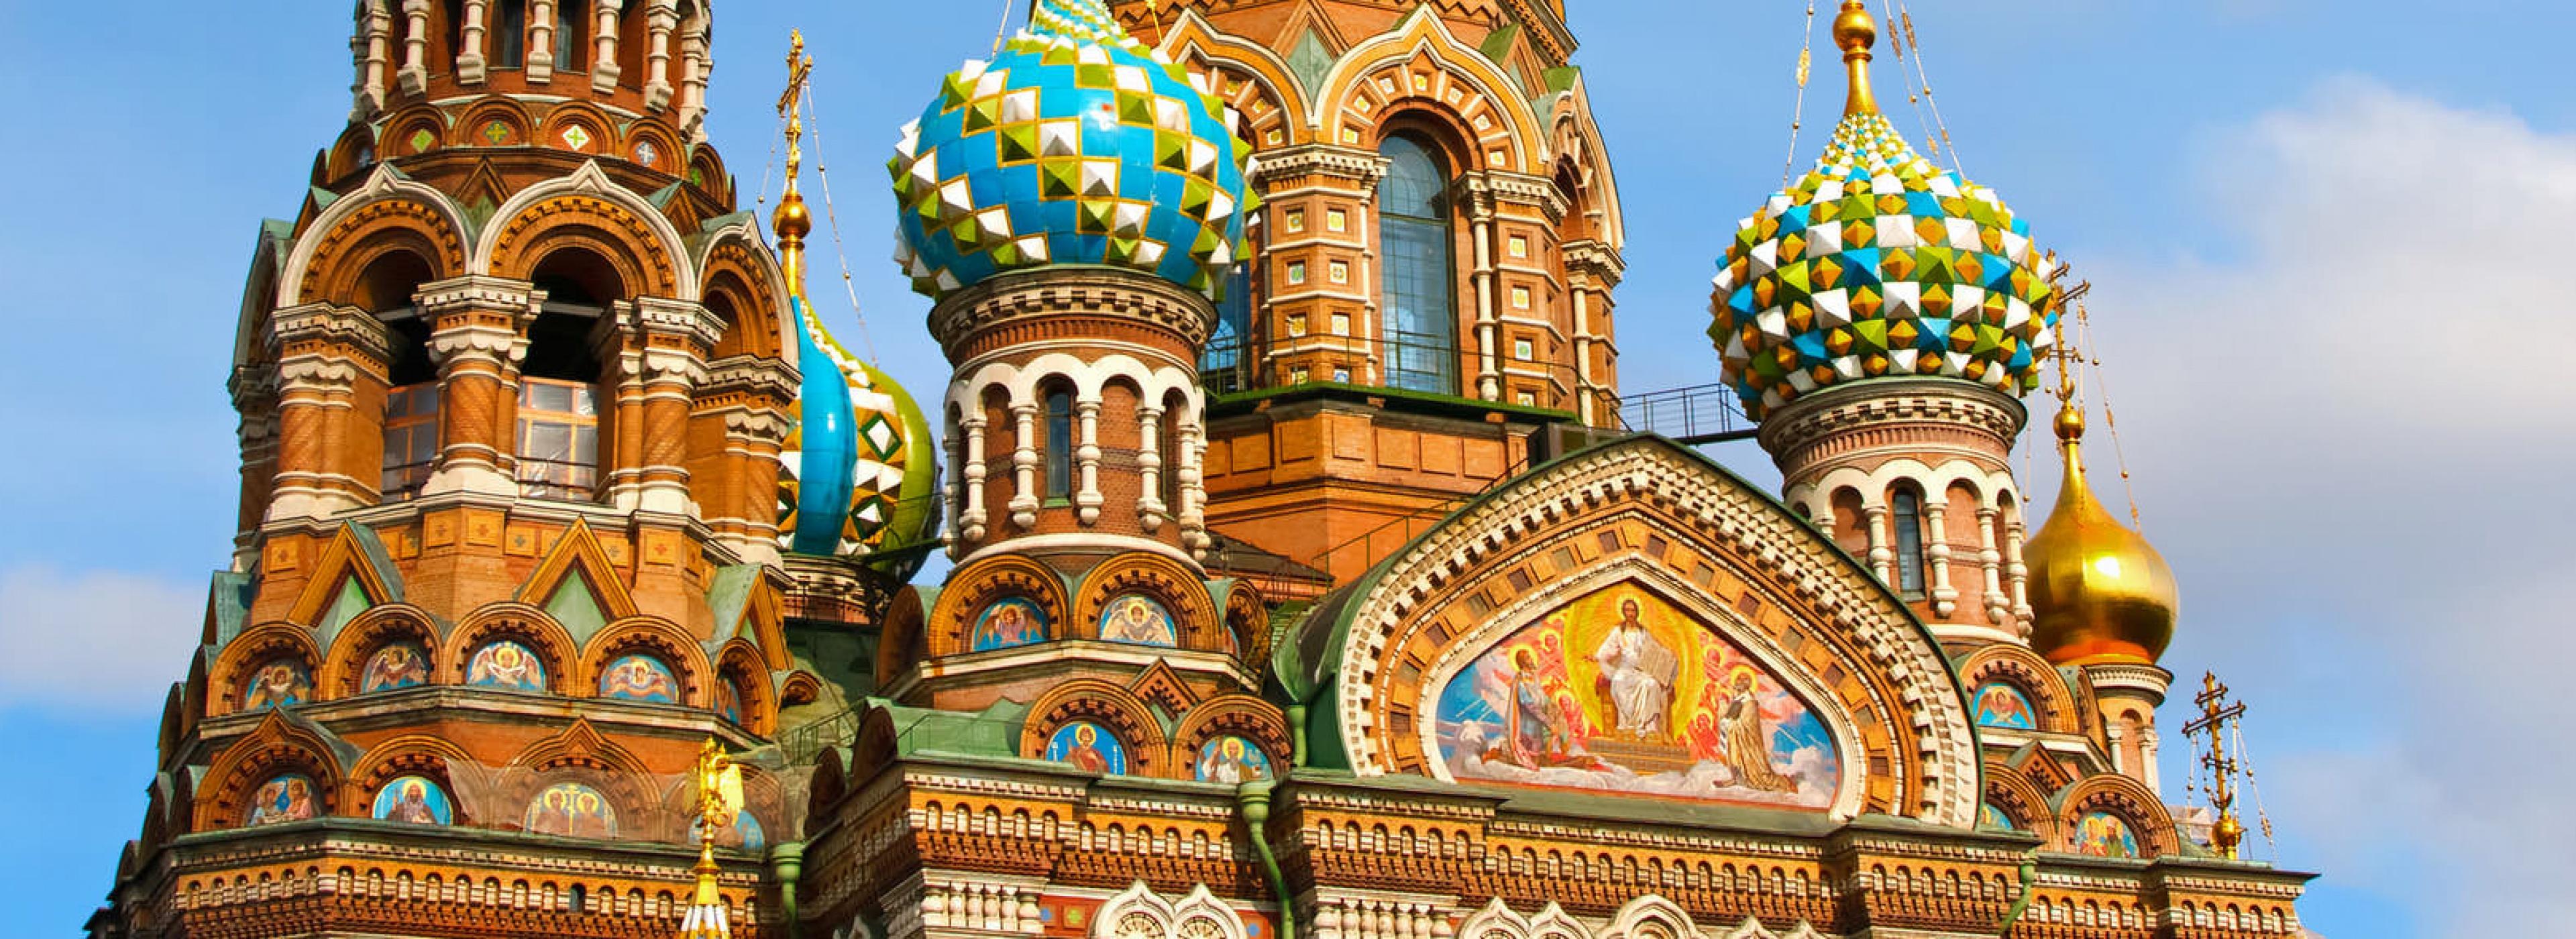 St Petersburg Tour